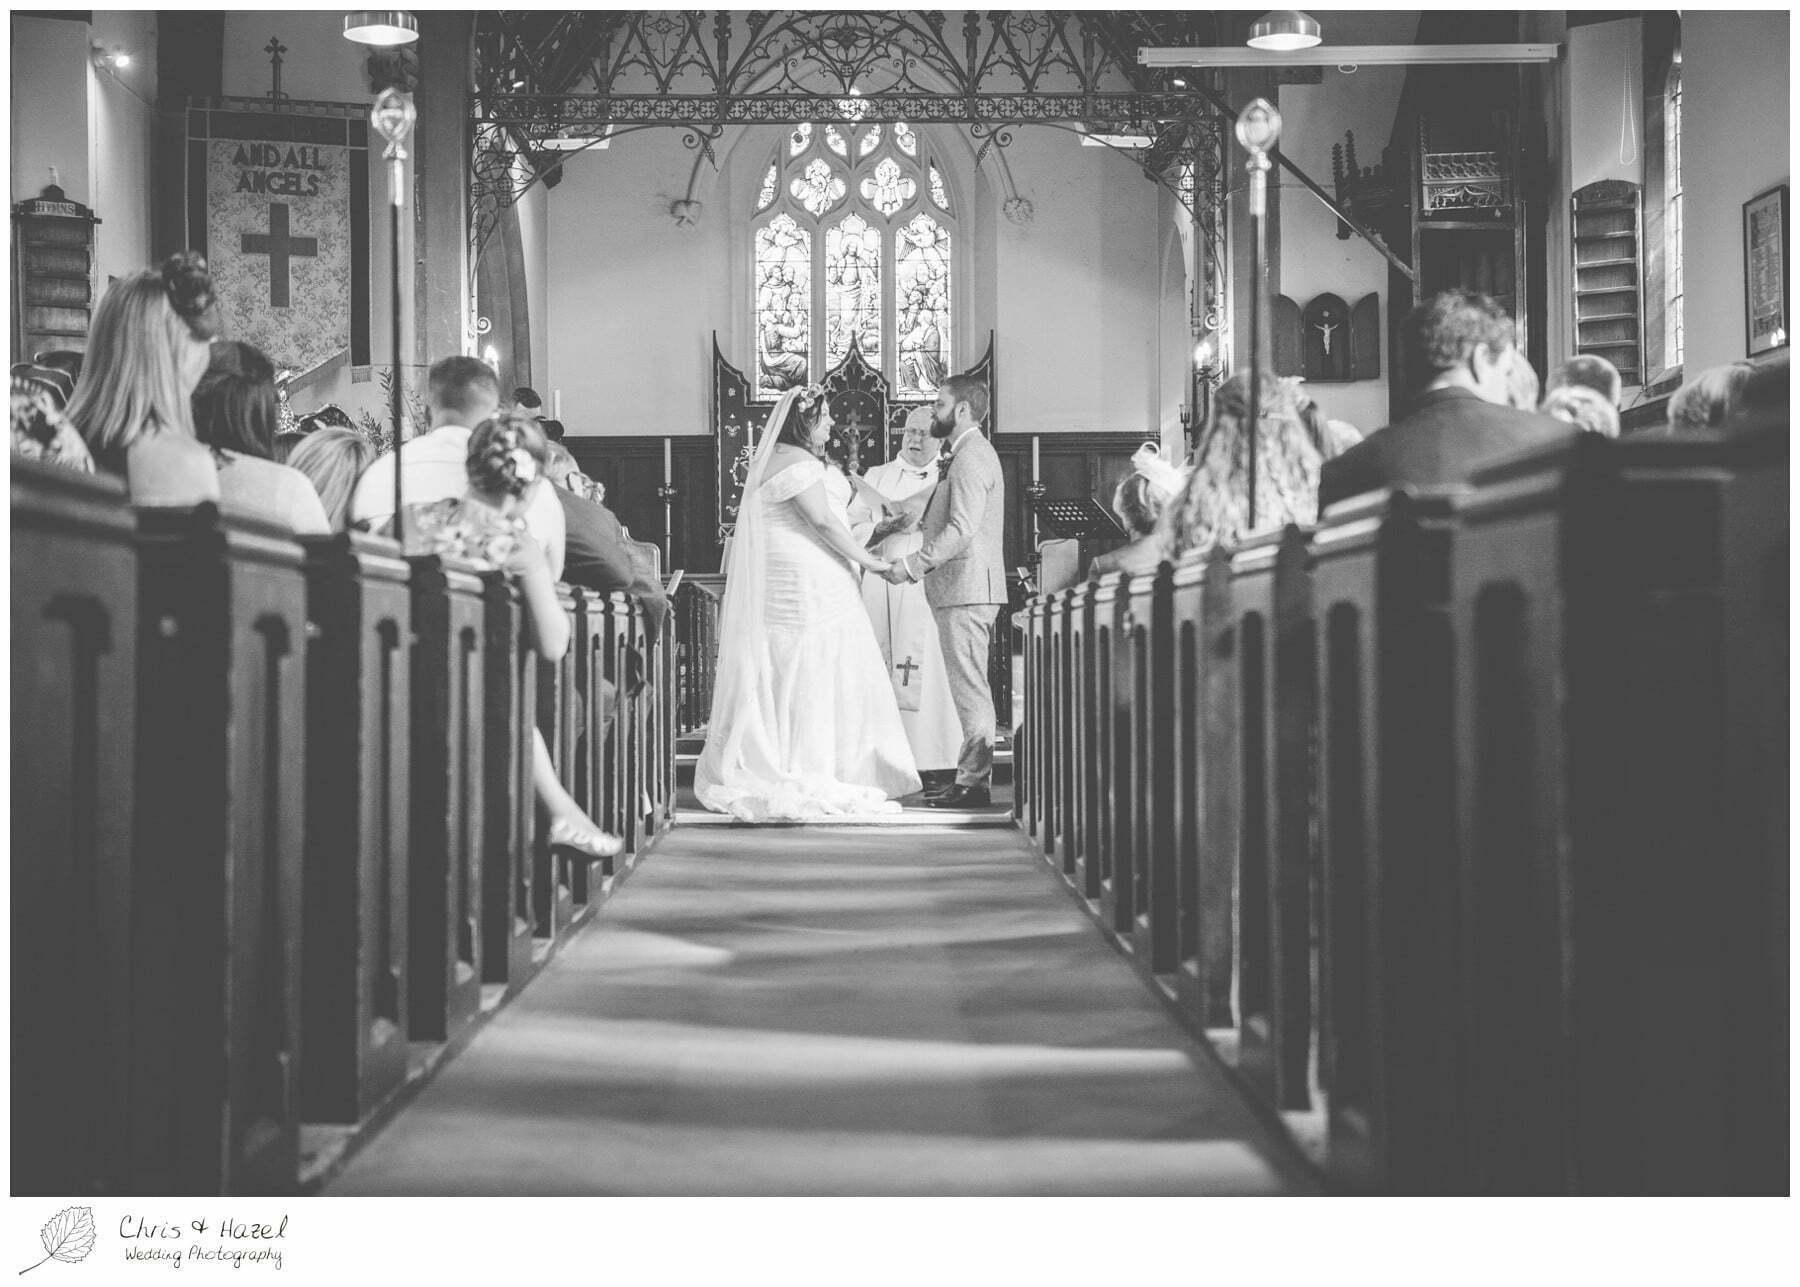 Bride and groom at altar, Hilperton Church, St Michael & All Angels' Church, Wedding Photography, Wiltshire Wedding Photographer Trowbridge, Chris and Hazel Wedding Photography